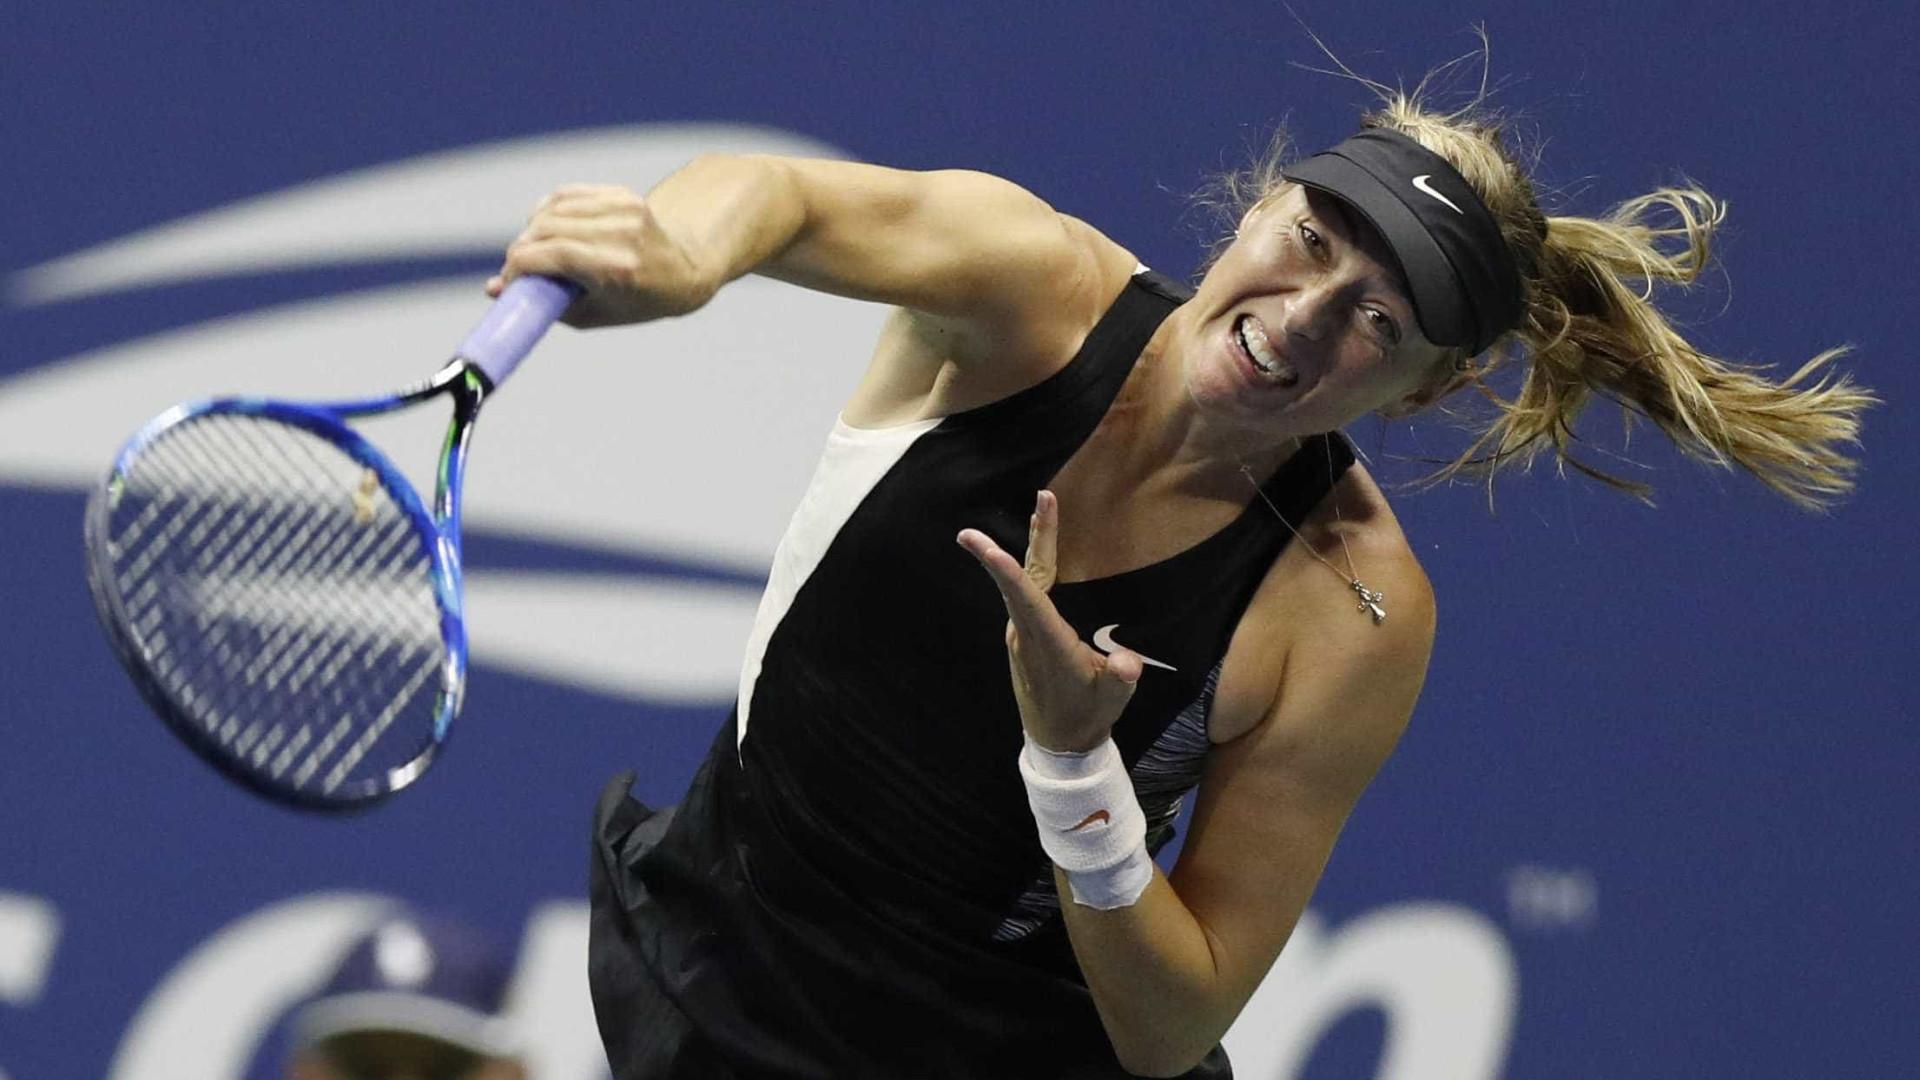 Sharapova vence romena e duela com Ostapenko no US Open